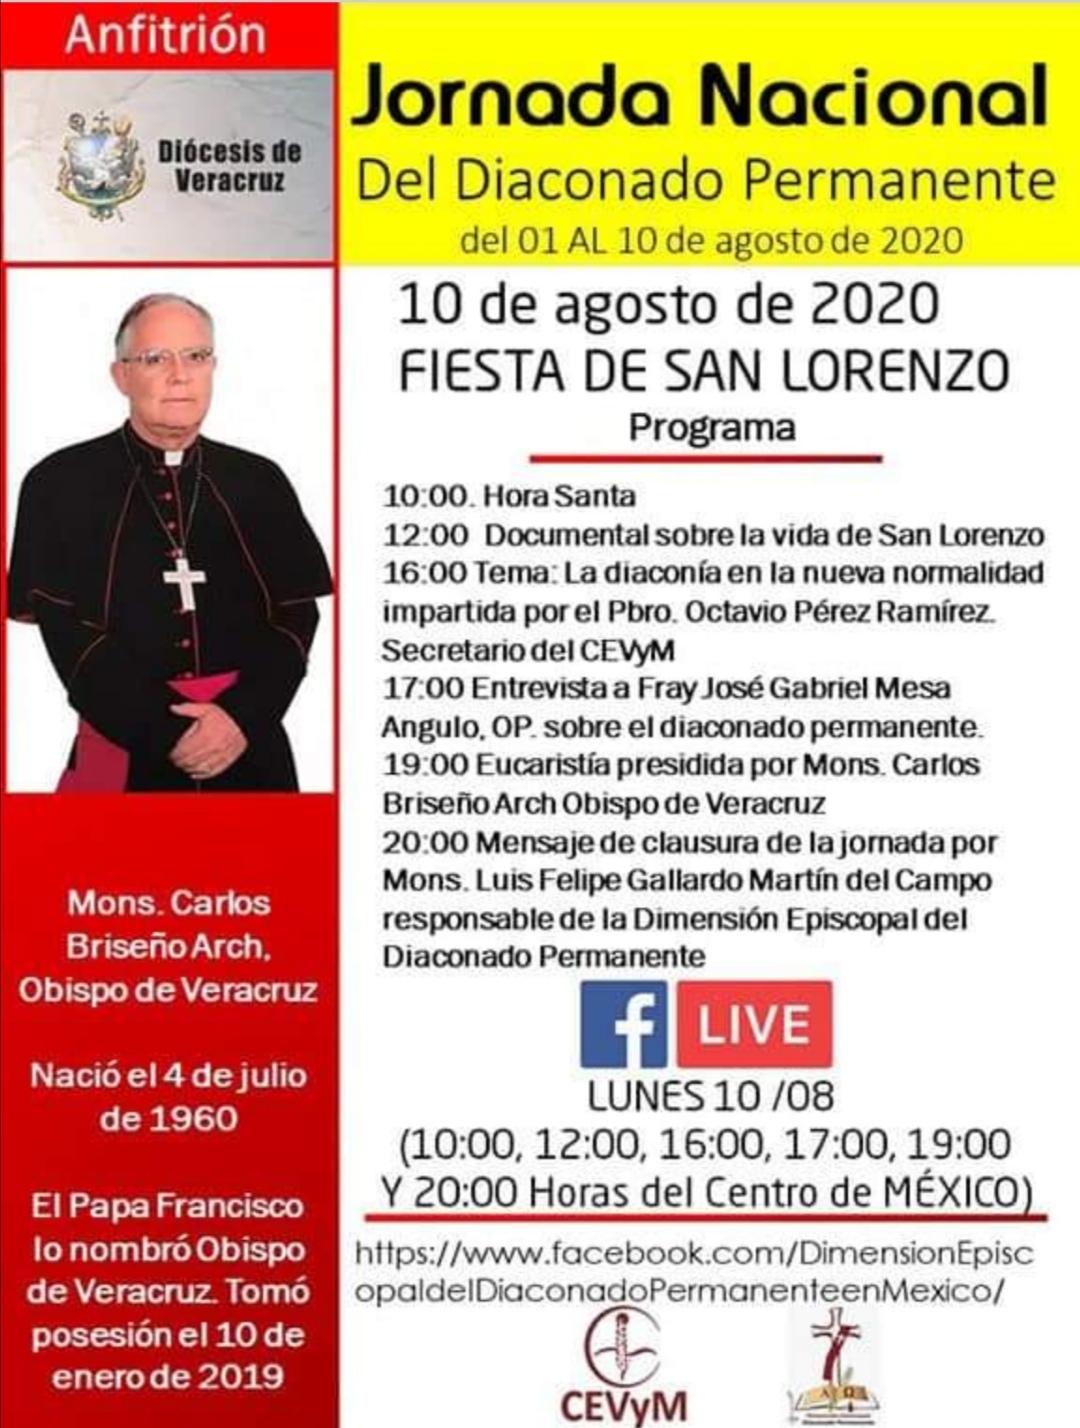 Iglesia de México. Jornada de Oración del Diaconado Permanente, día 10